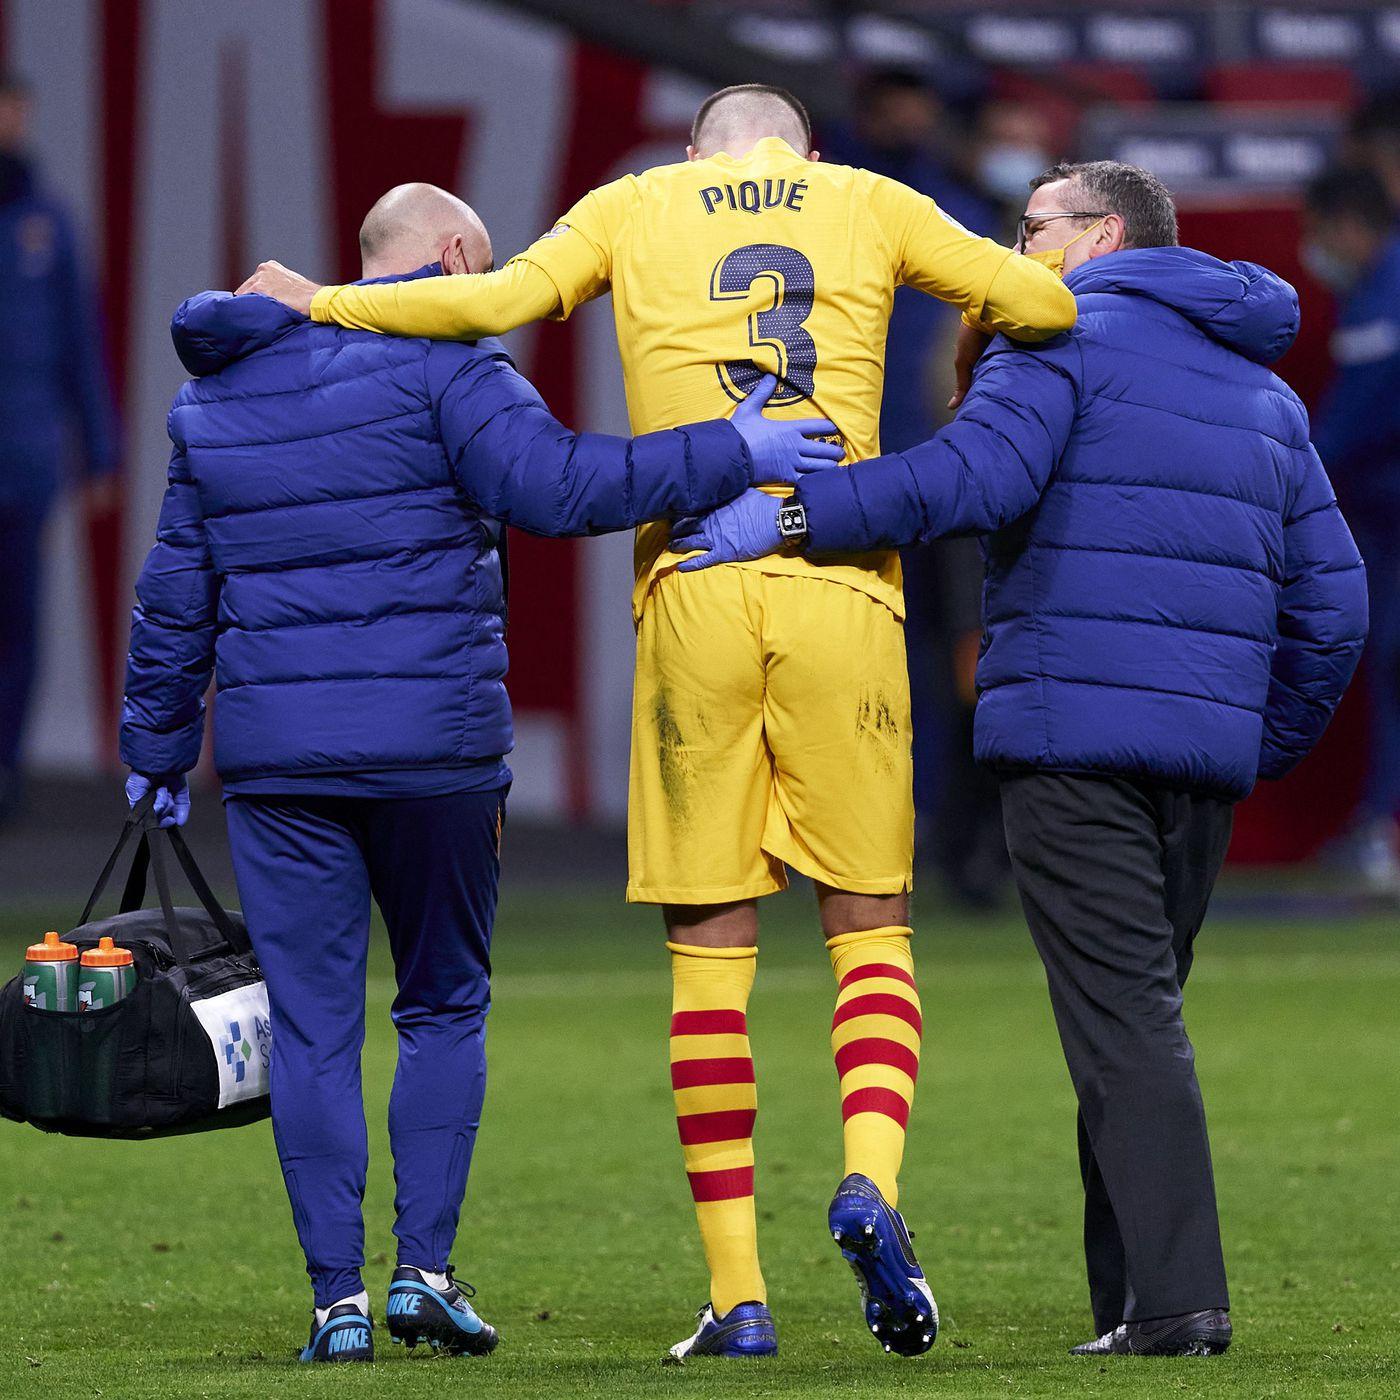 Gerard Pique and Sergi Roberto pick up injuries against Atletico - Barca  Blaugranes